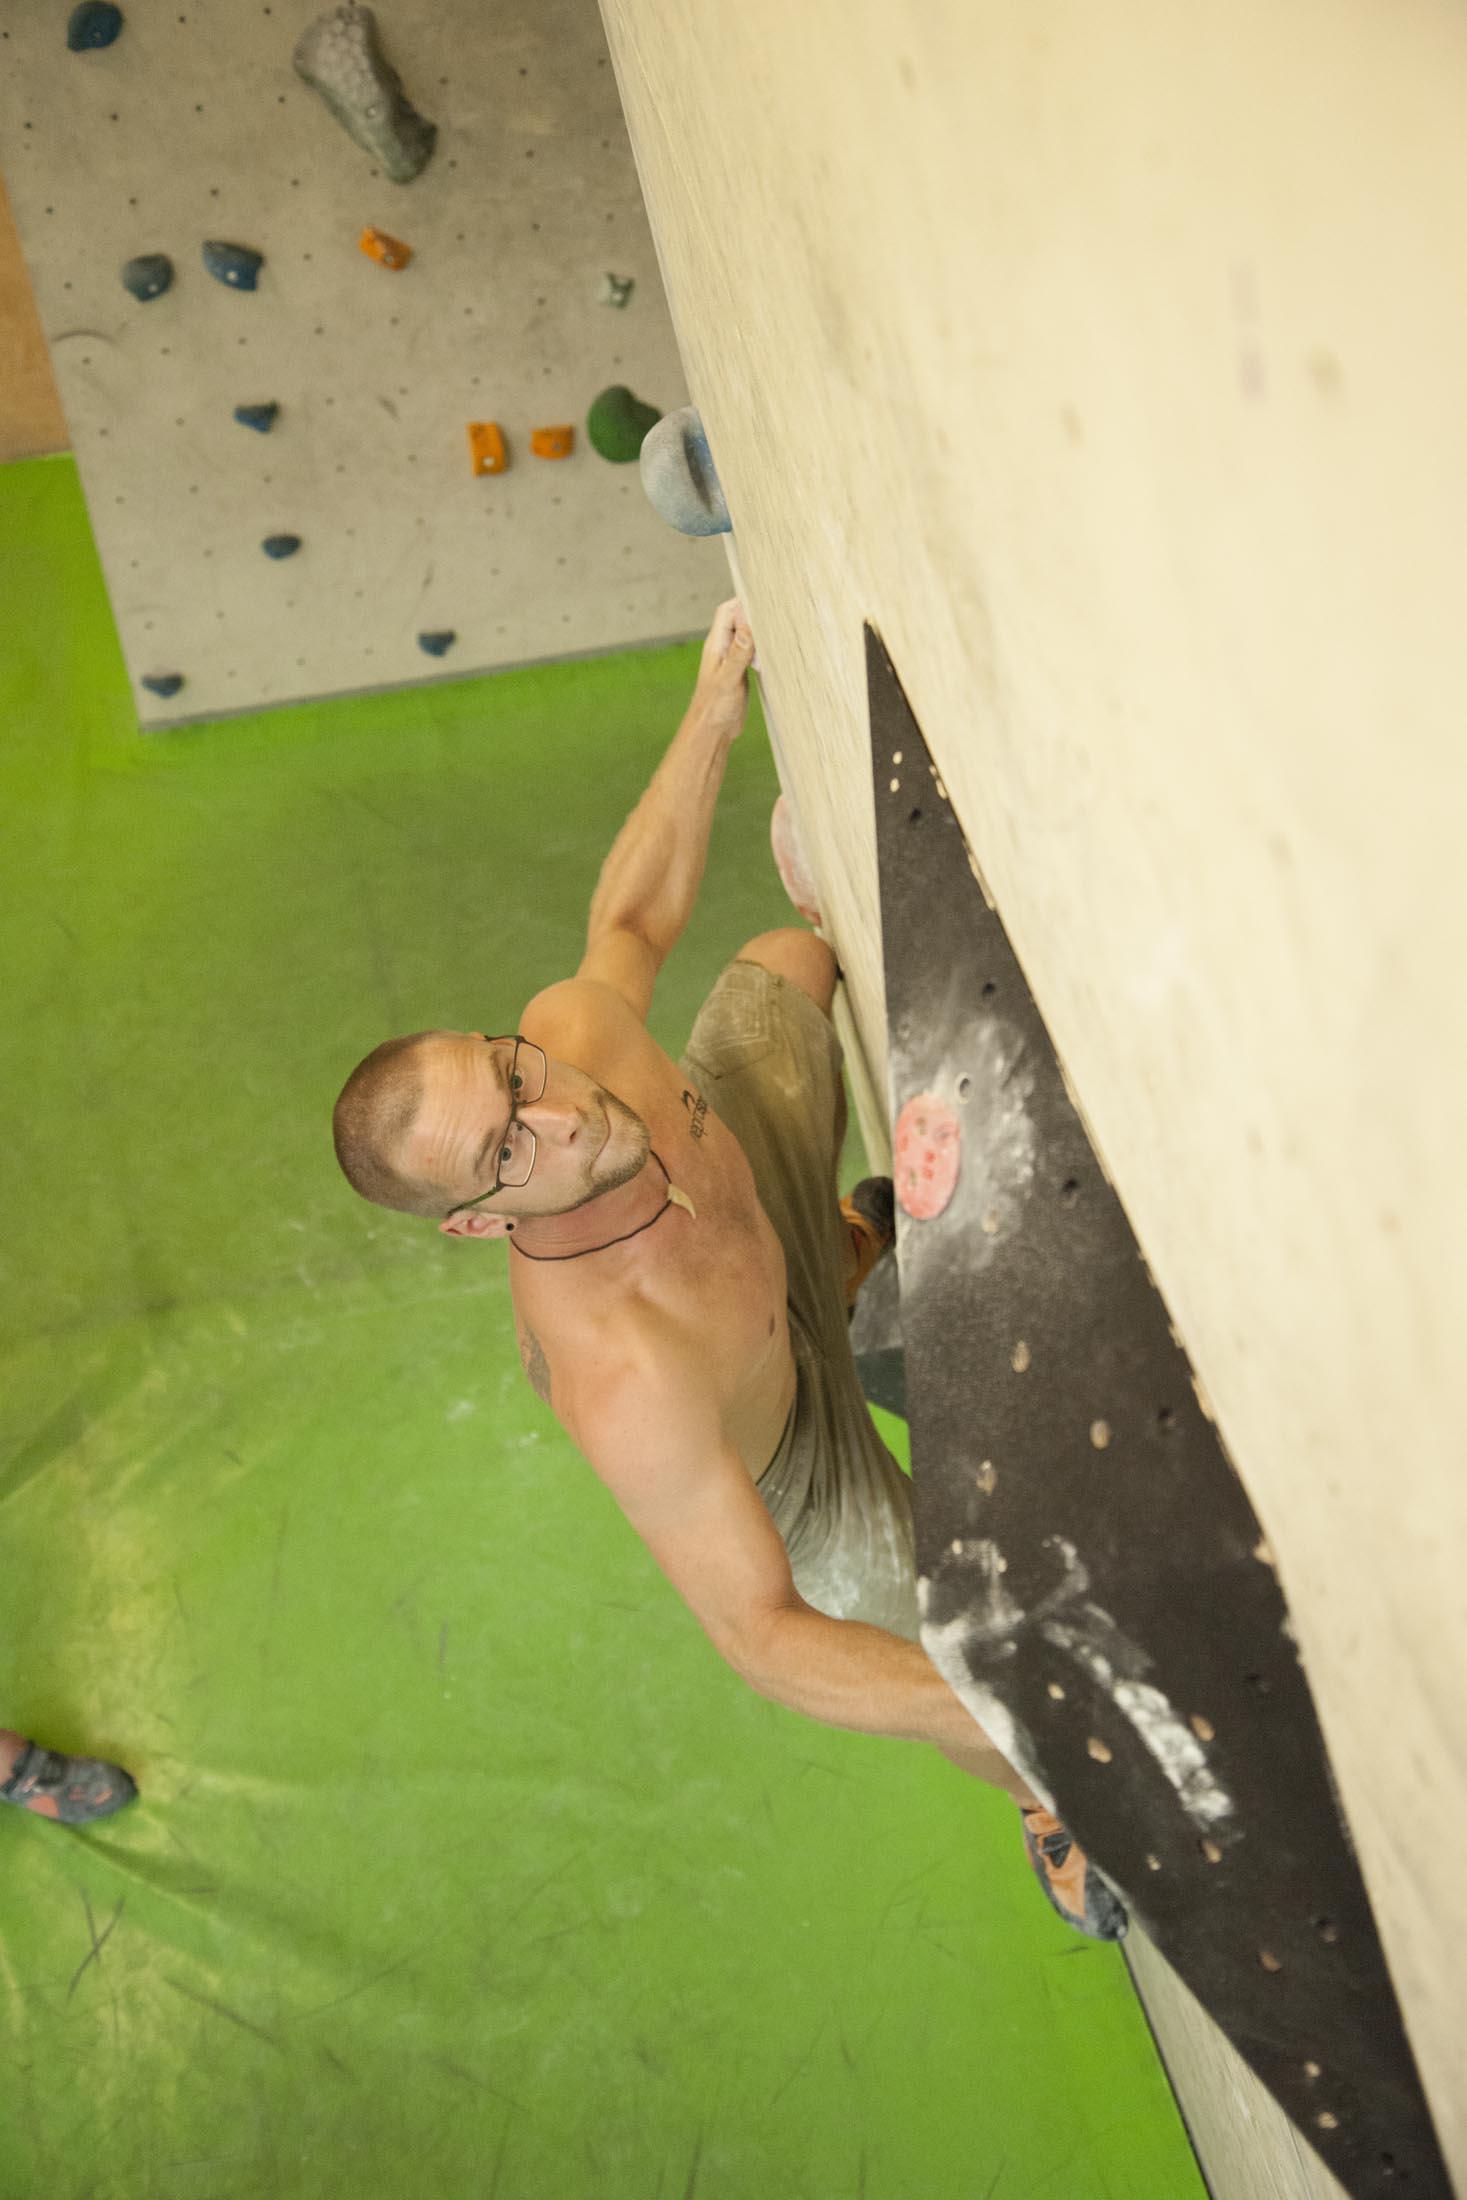 Quali, internationaler bouldercup Frankenjura 2016, BLOCKHELDEN Erlangen, Mammut, Bergfreunde.de, Boulderwettkampf07092016147